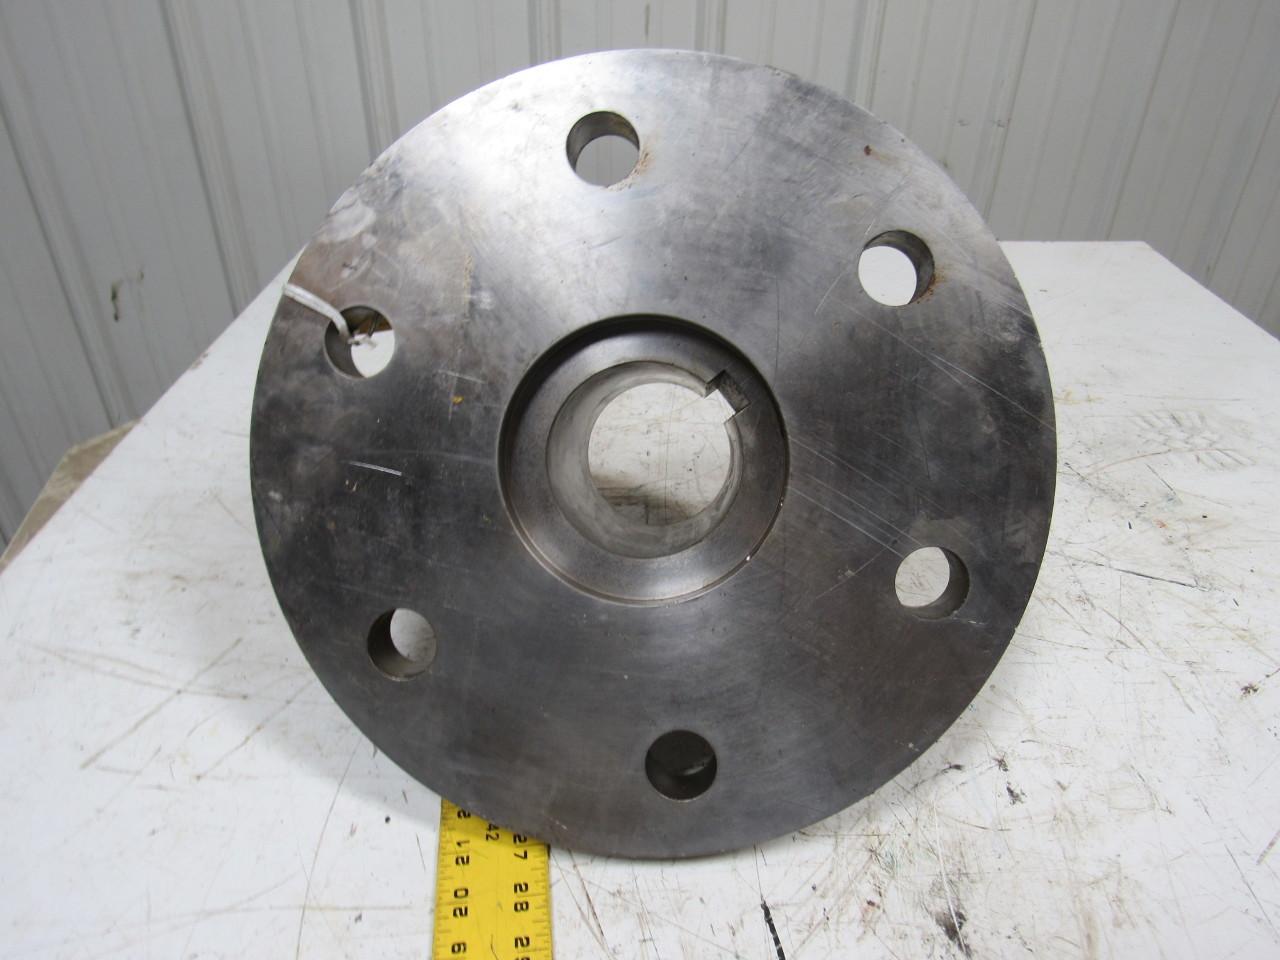 373098 motor coupling hub 14 od 3 1 2 keyed bore flange for Flange mounted motor catalogue